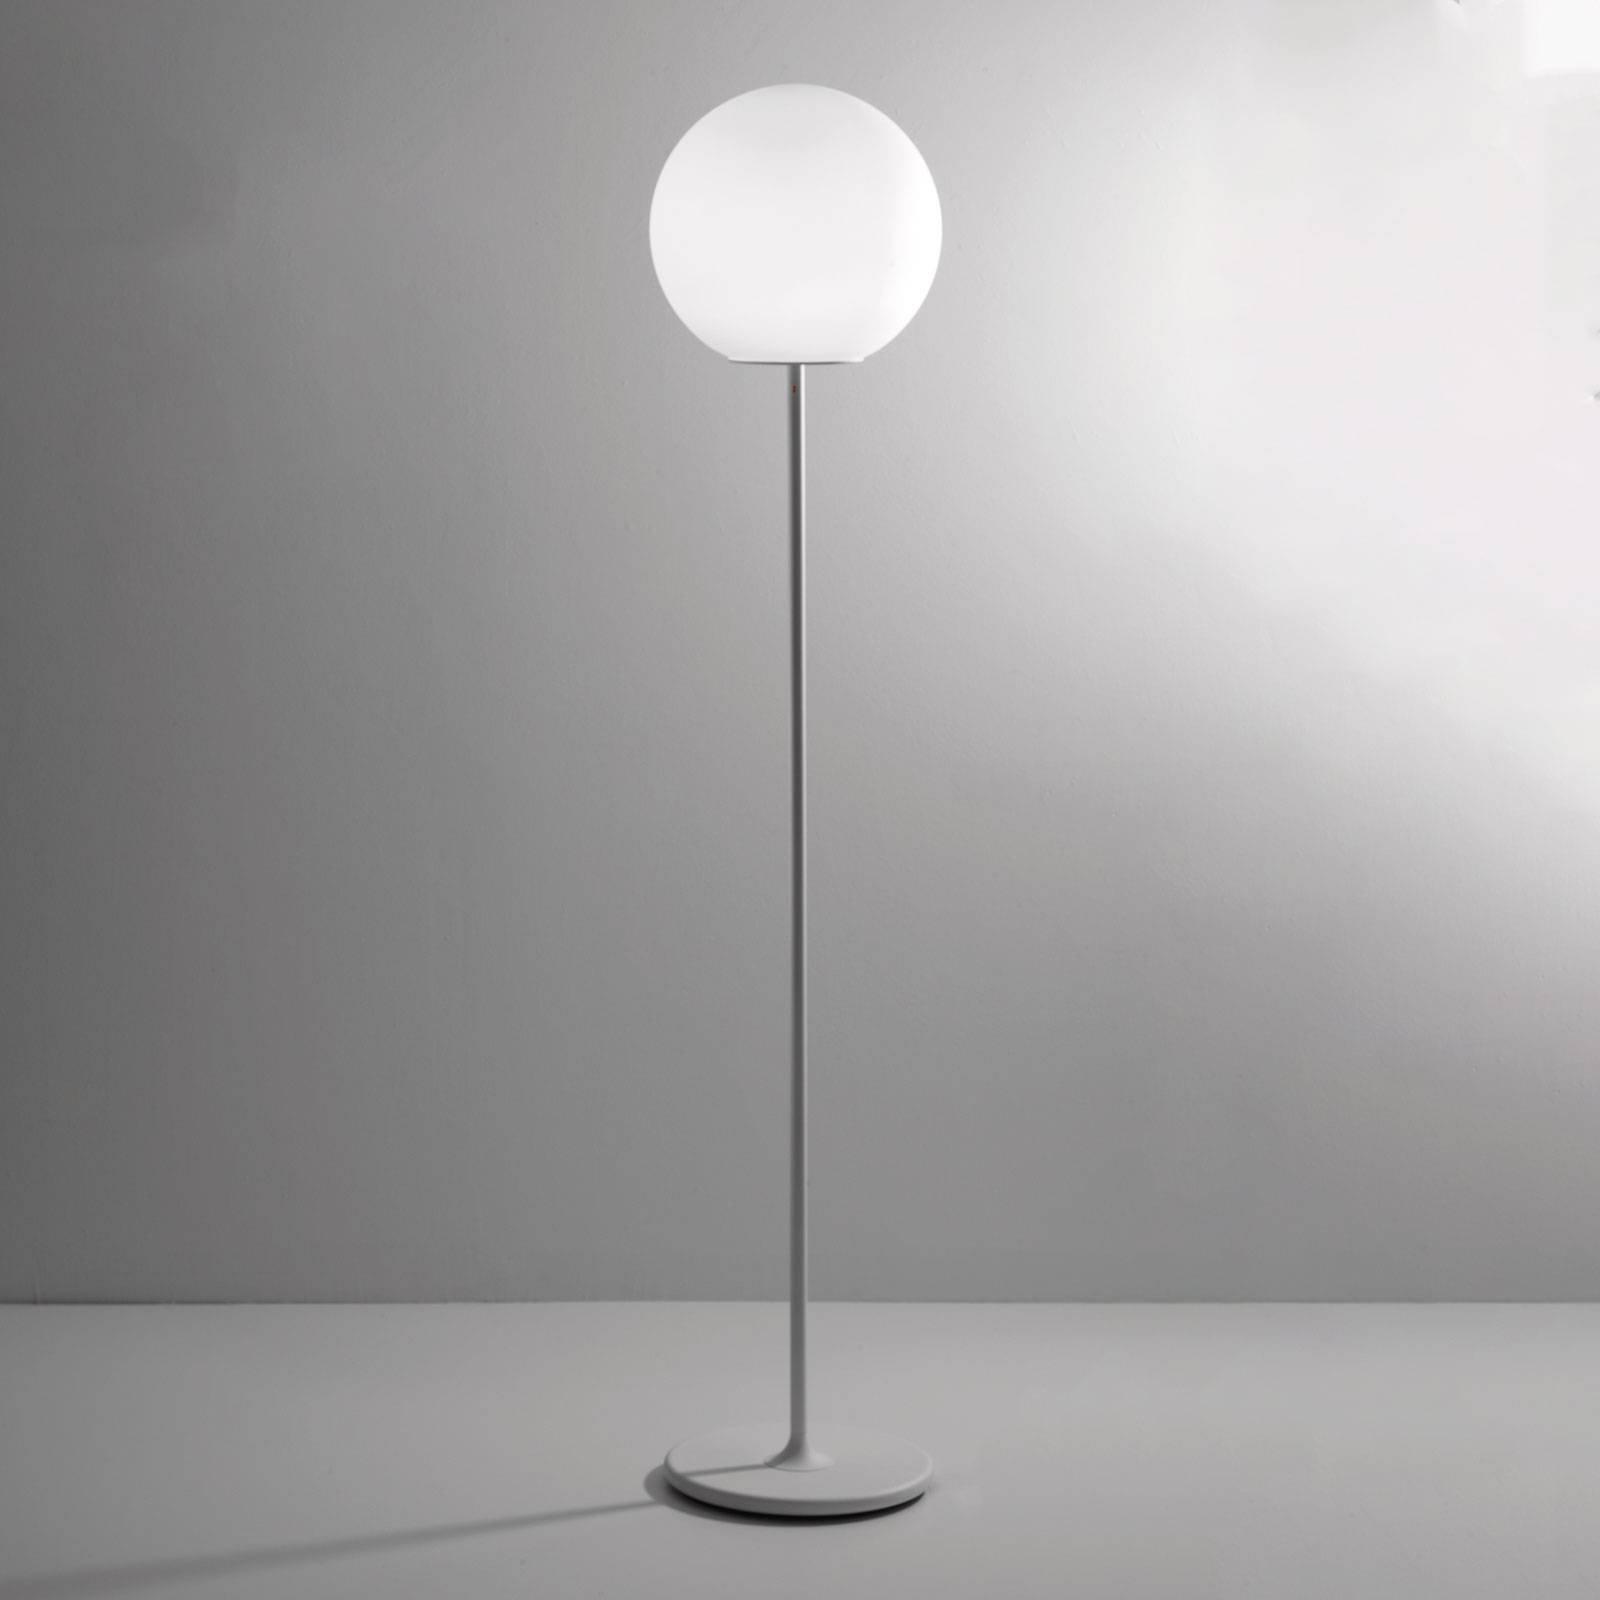 Fabbian Lumi Sfera gulvlampe av glass, Ø 35 cm